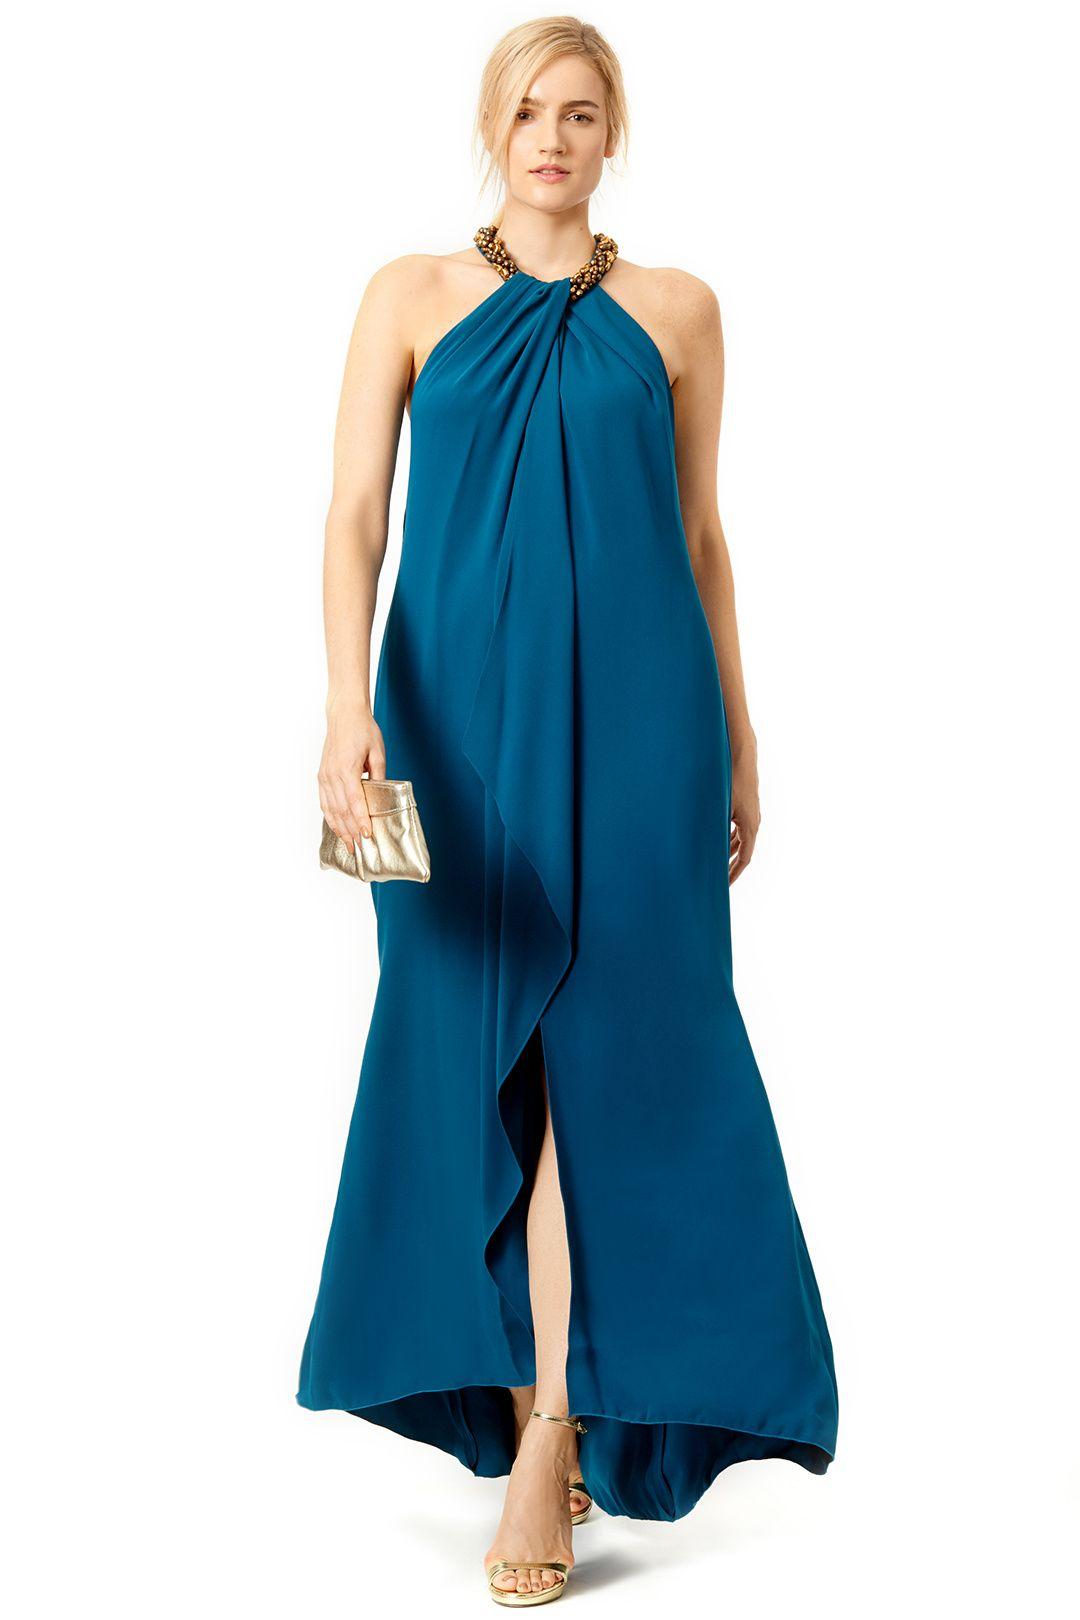 10 Plus Size Wedding Guest Dress Ideas On Thecurvyfashionista Tcfstyle